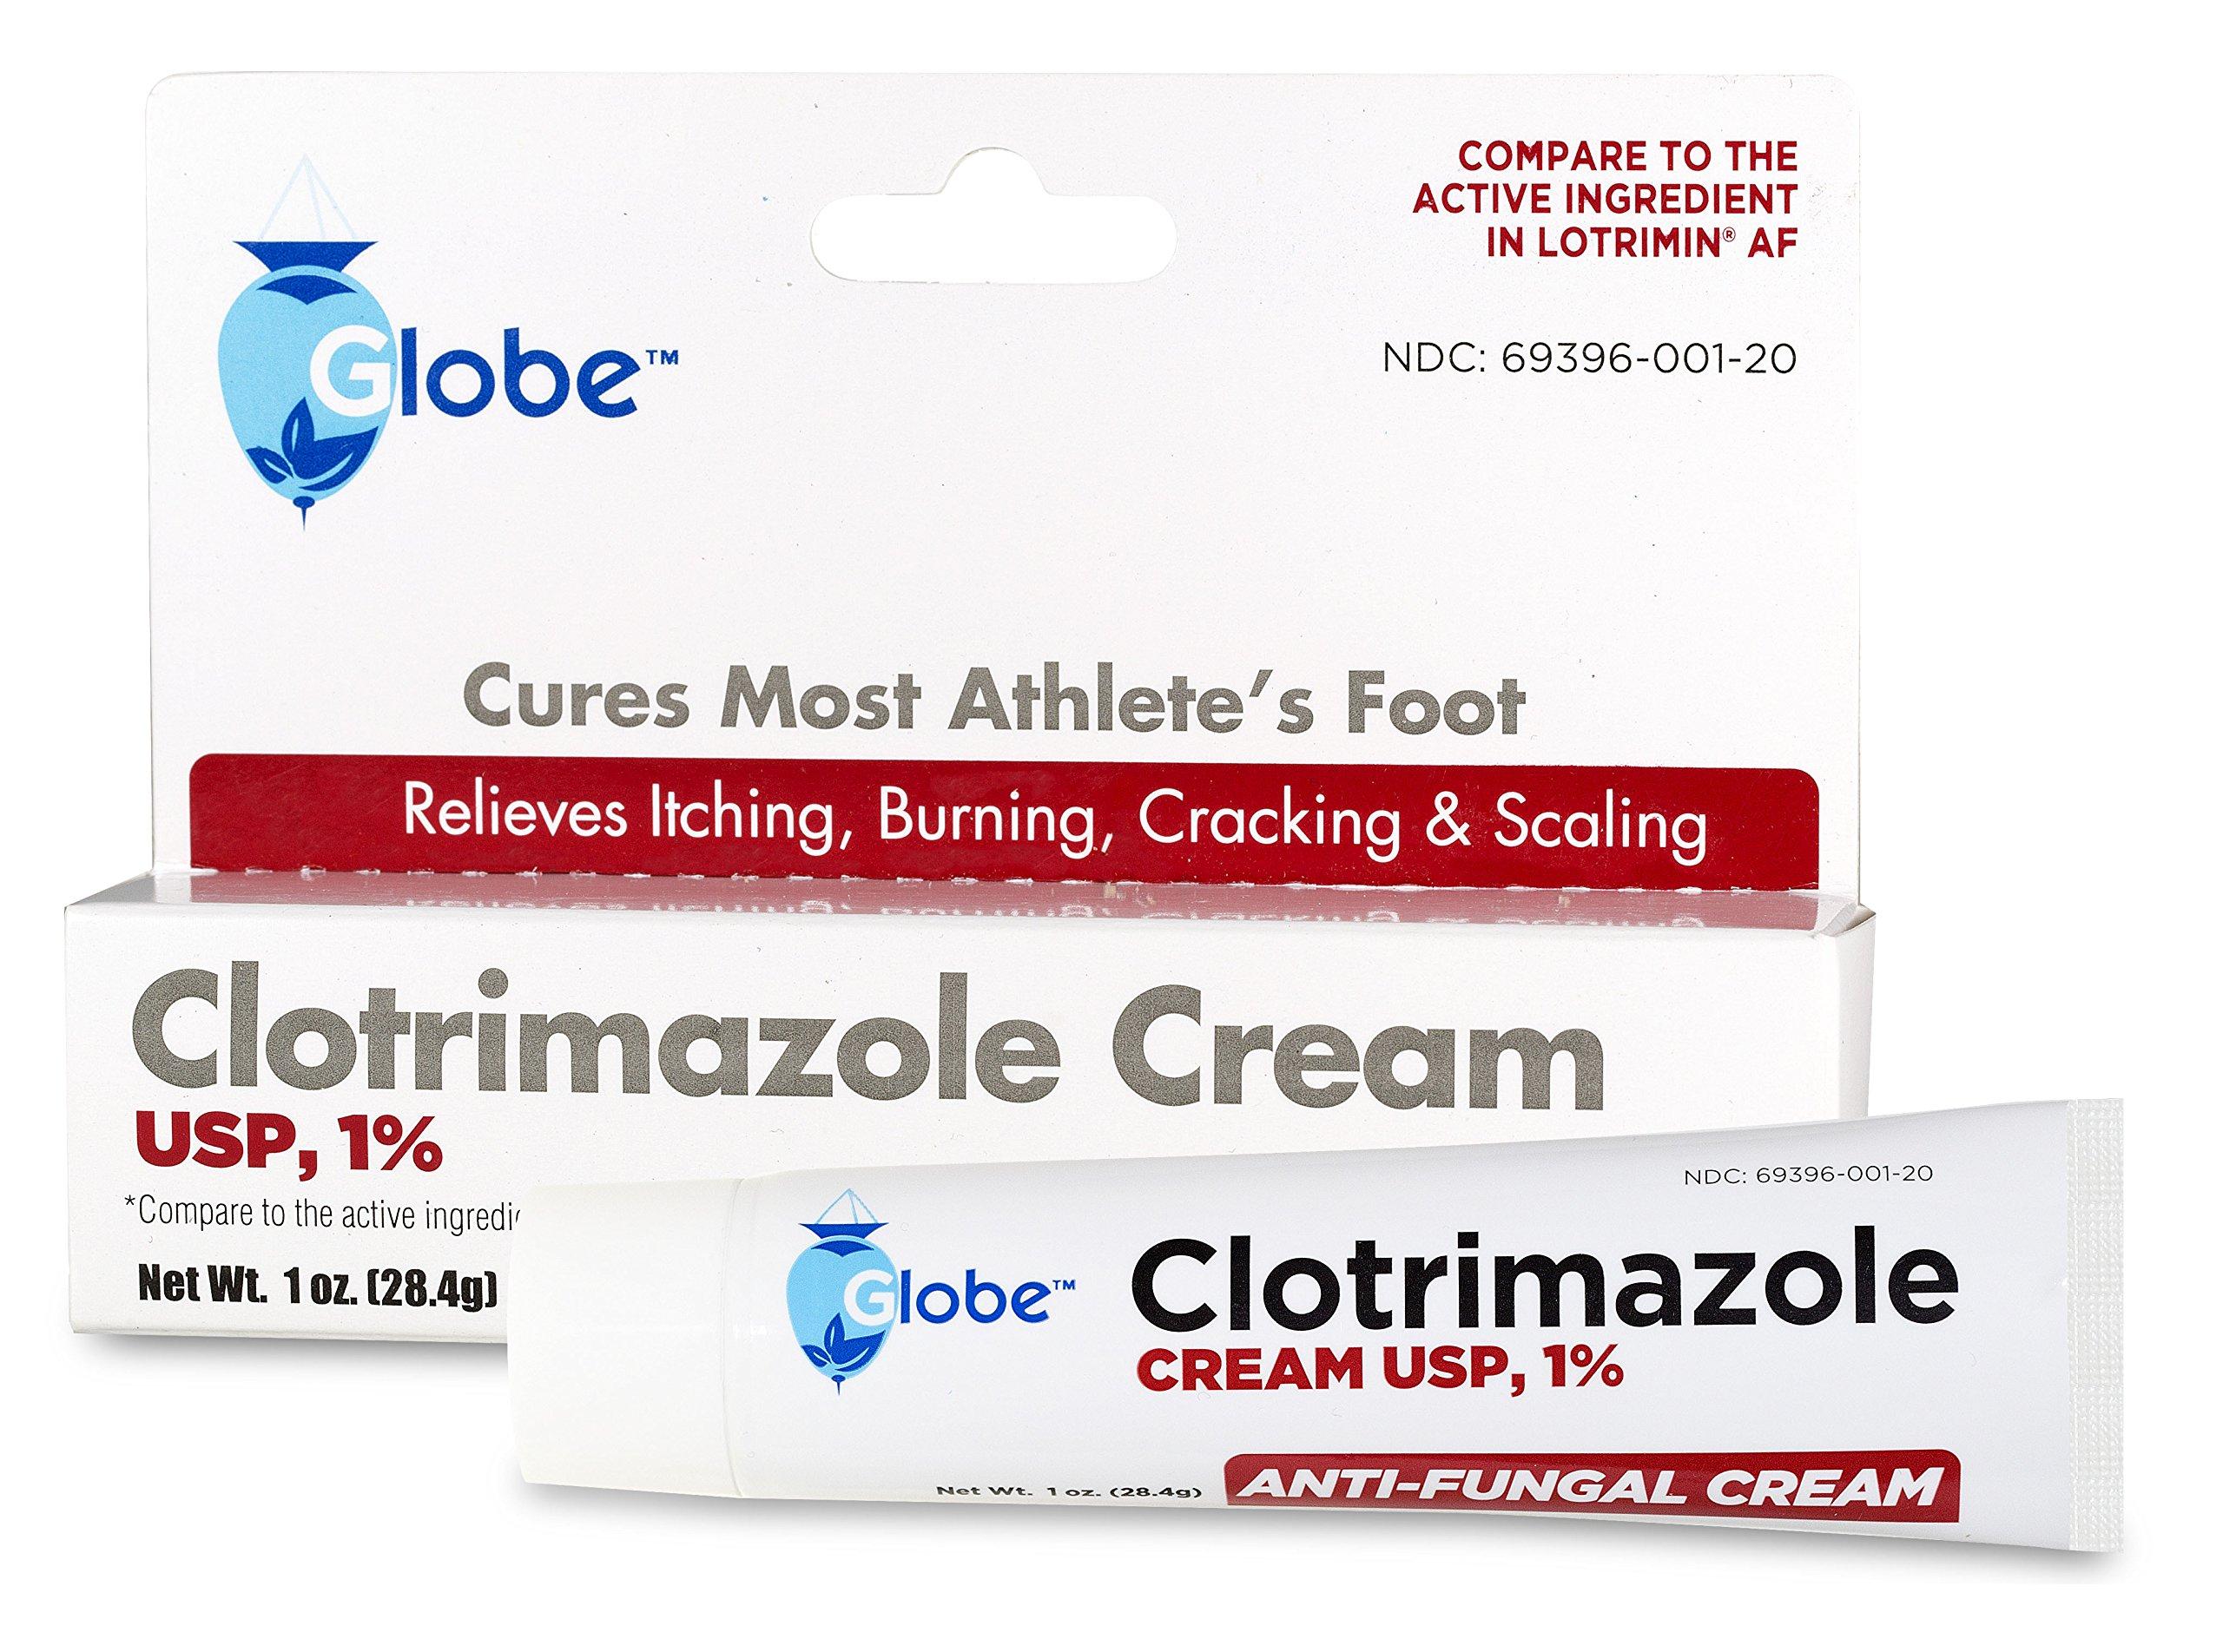 Clotrimazole Antifungal Cream 1% USP 1 oz, (Compare to Lotrimin) (180 Tubes/Carton) Distributors Price by Globe